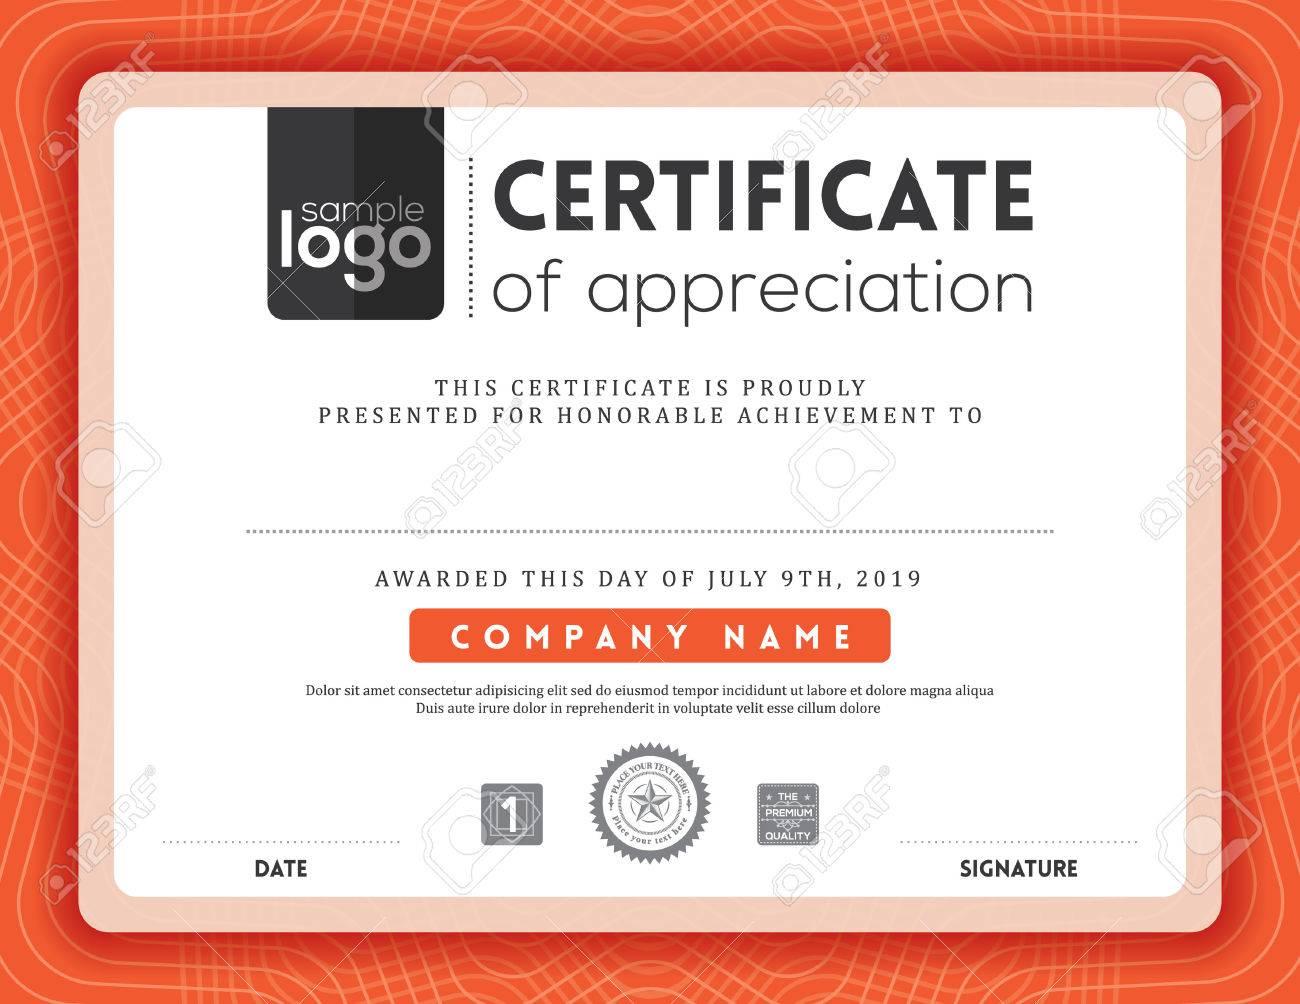 Modern certificate background frame design template - 53061938